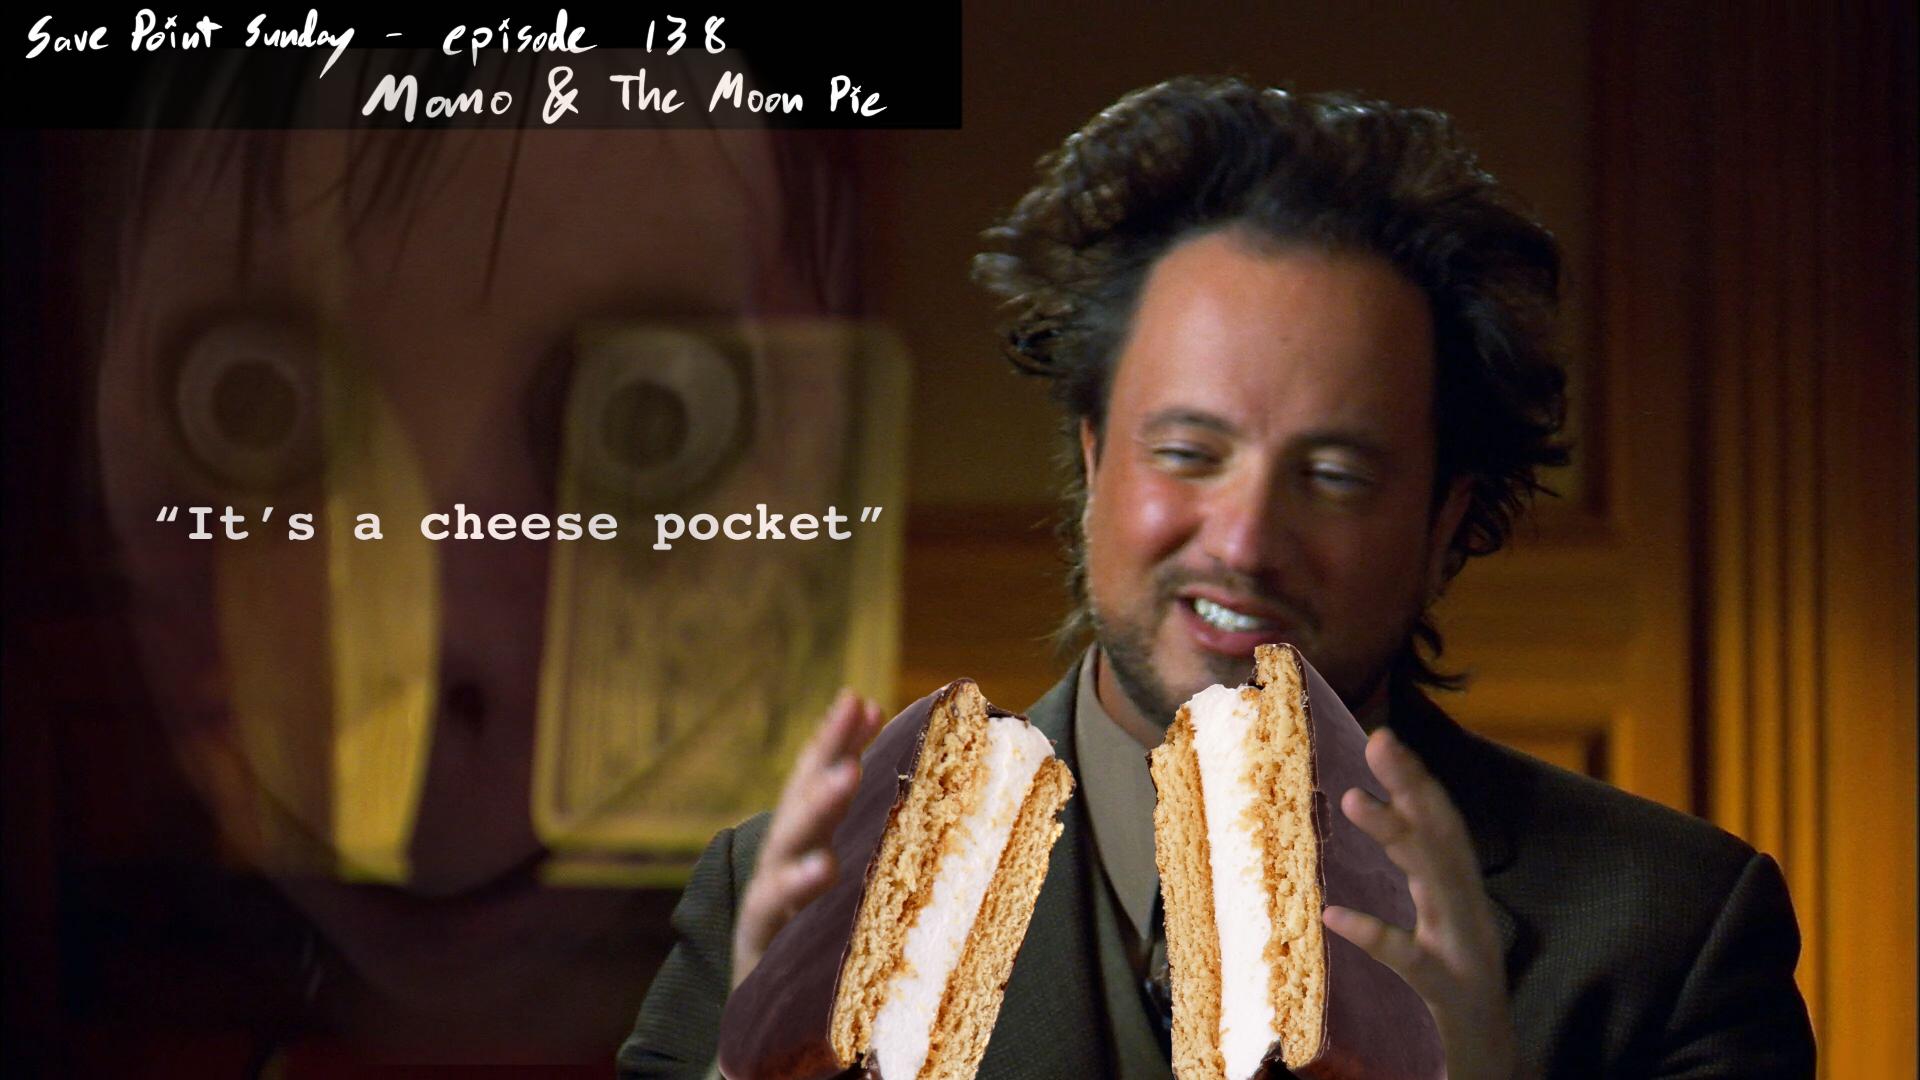 Episode 138: Momo & The Moon Pie